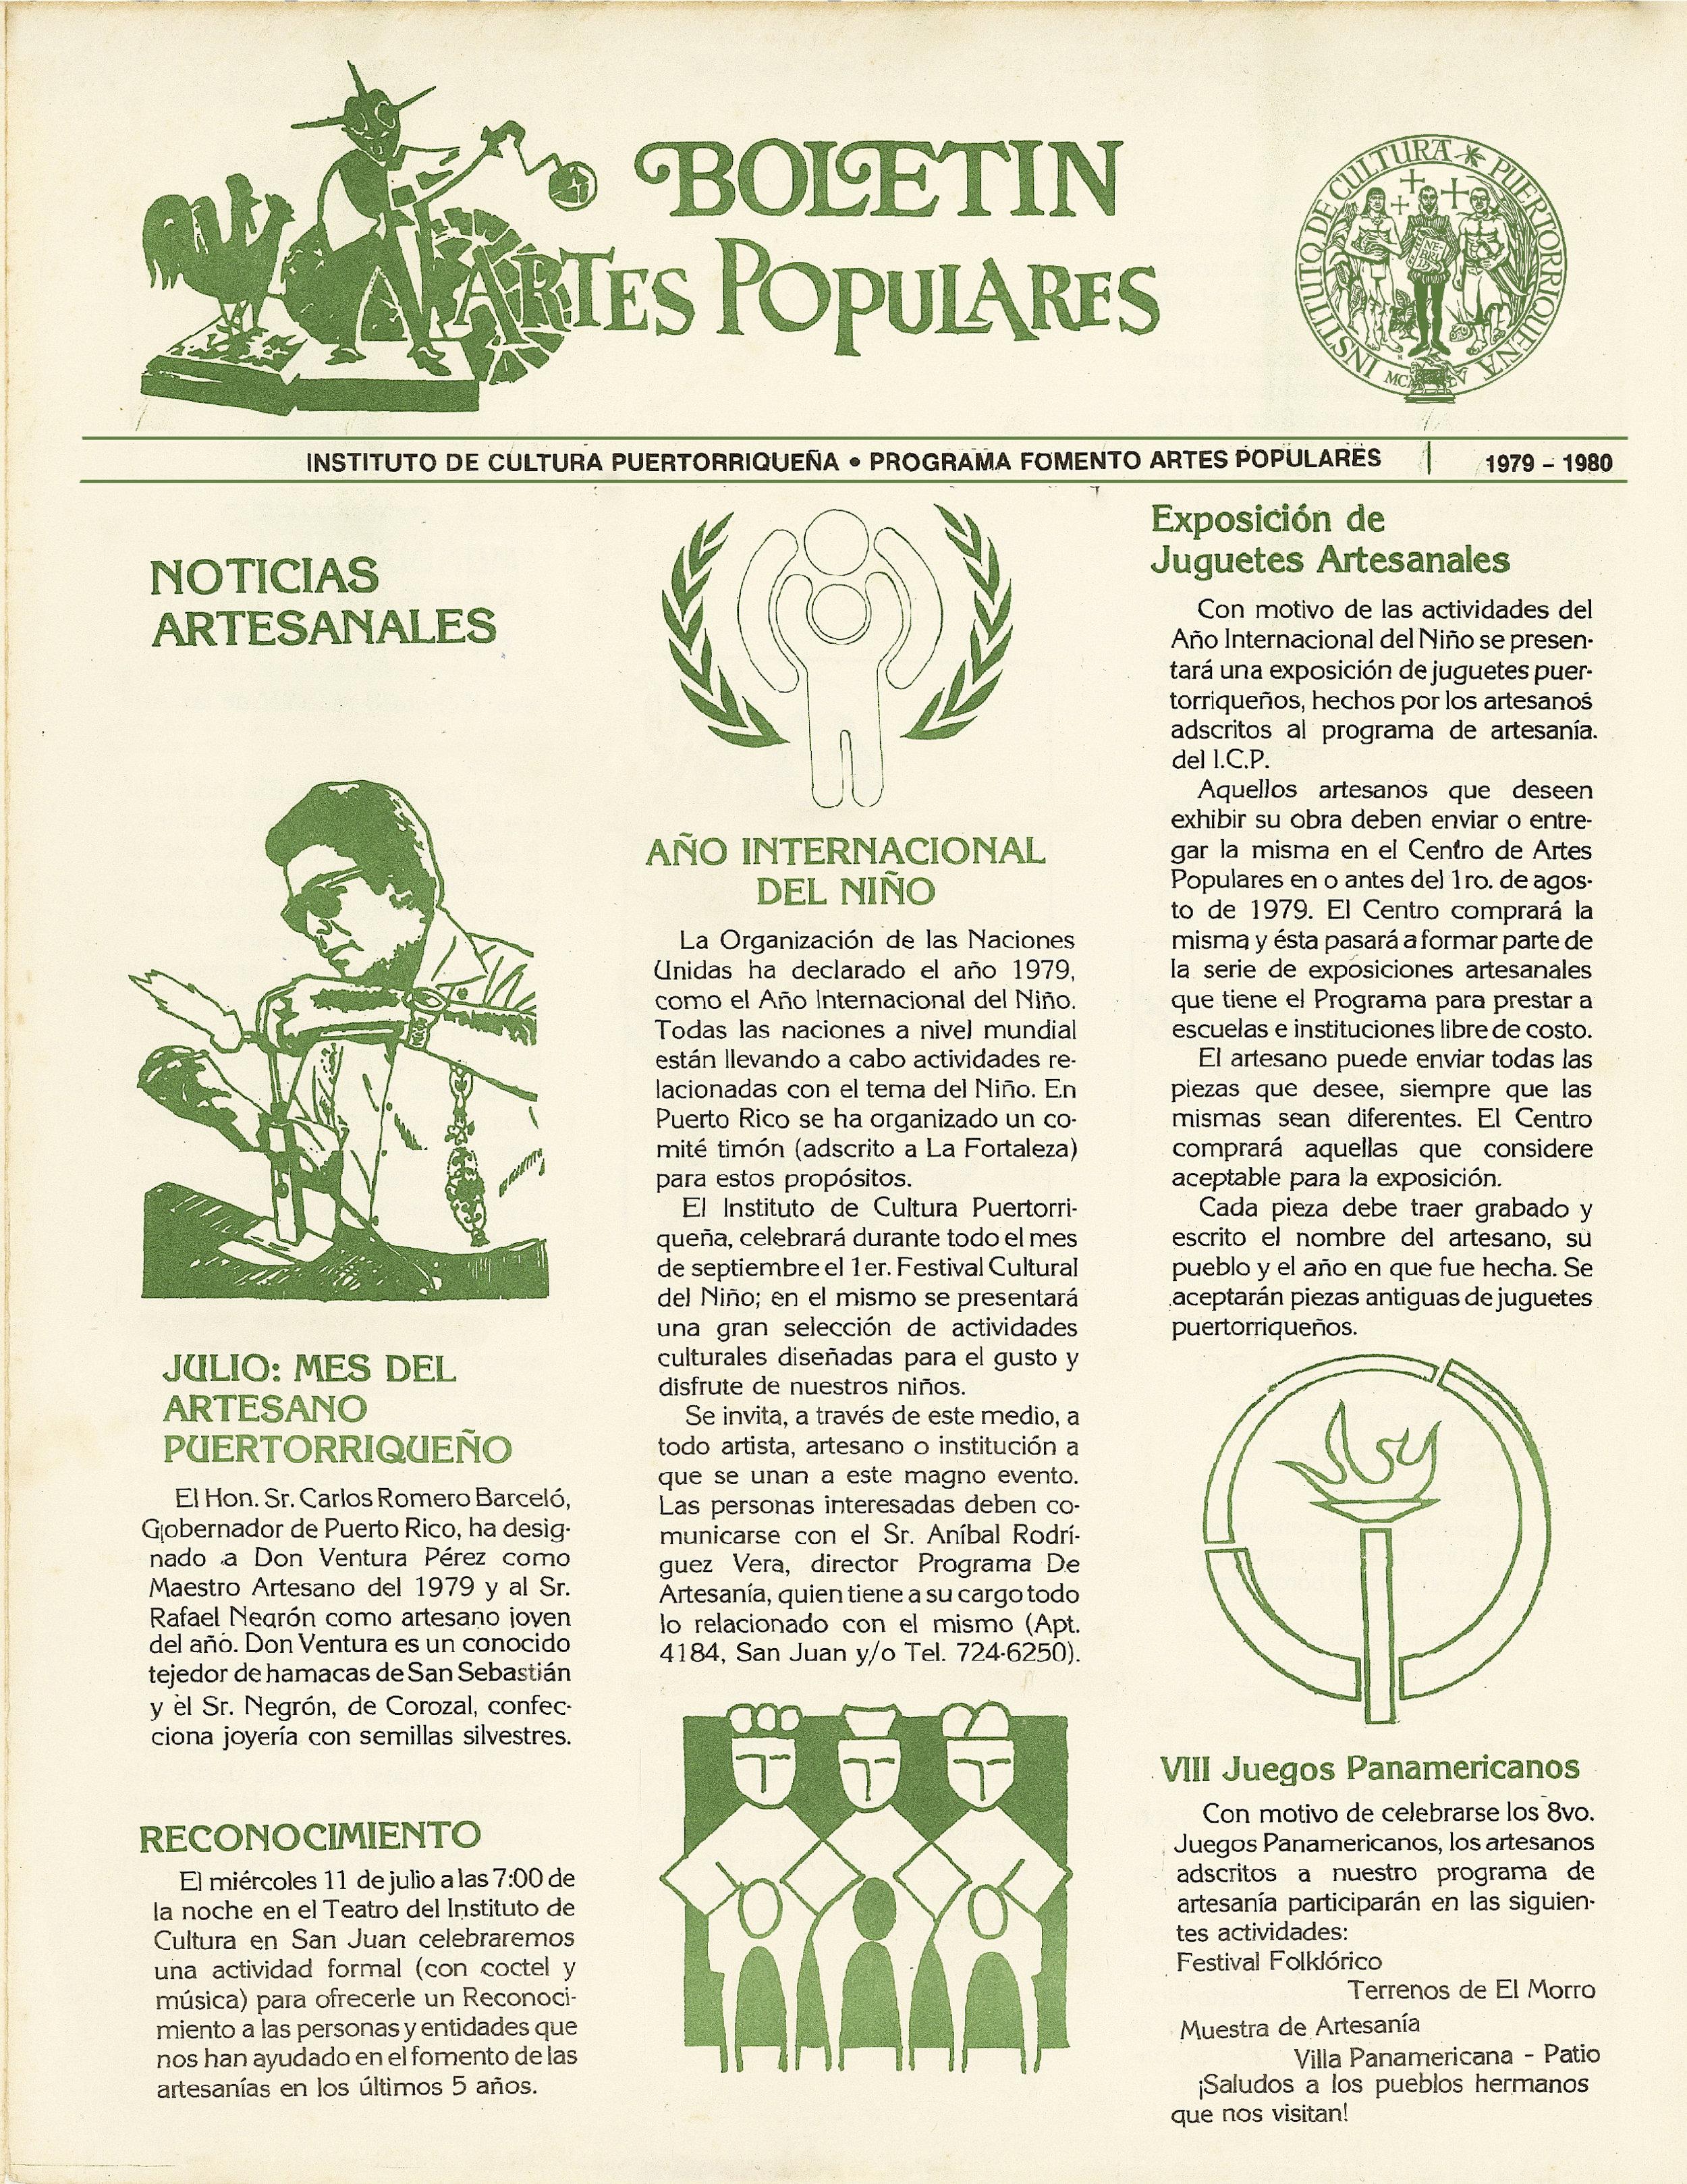 Boletín de Artes Populares-79-80 SUMPLEMENTO 1.jpg